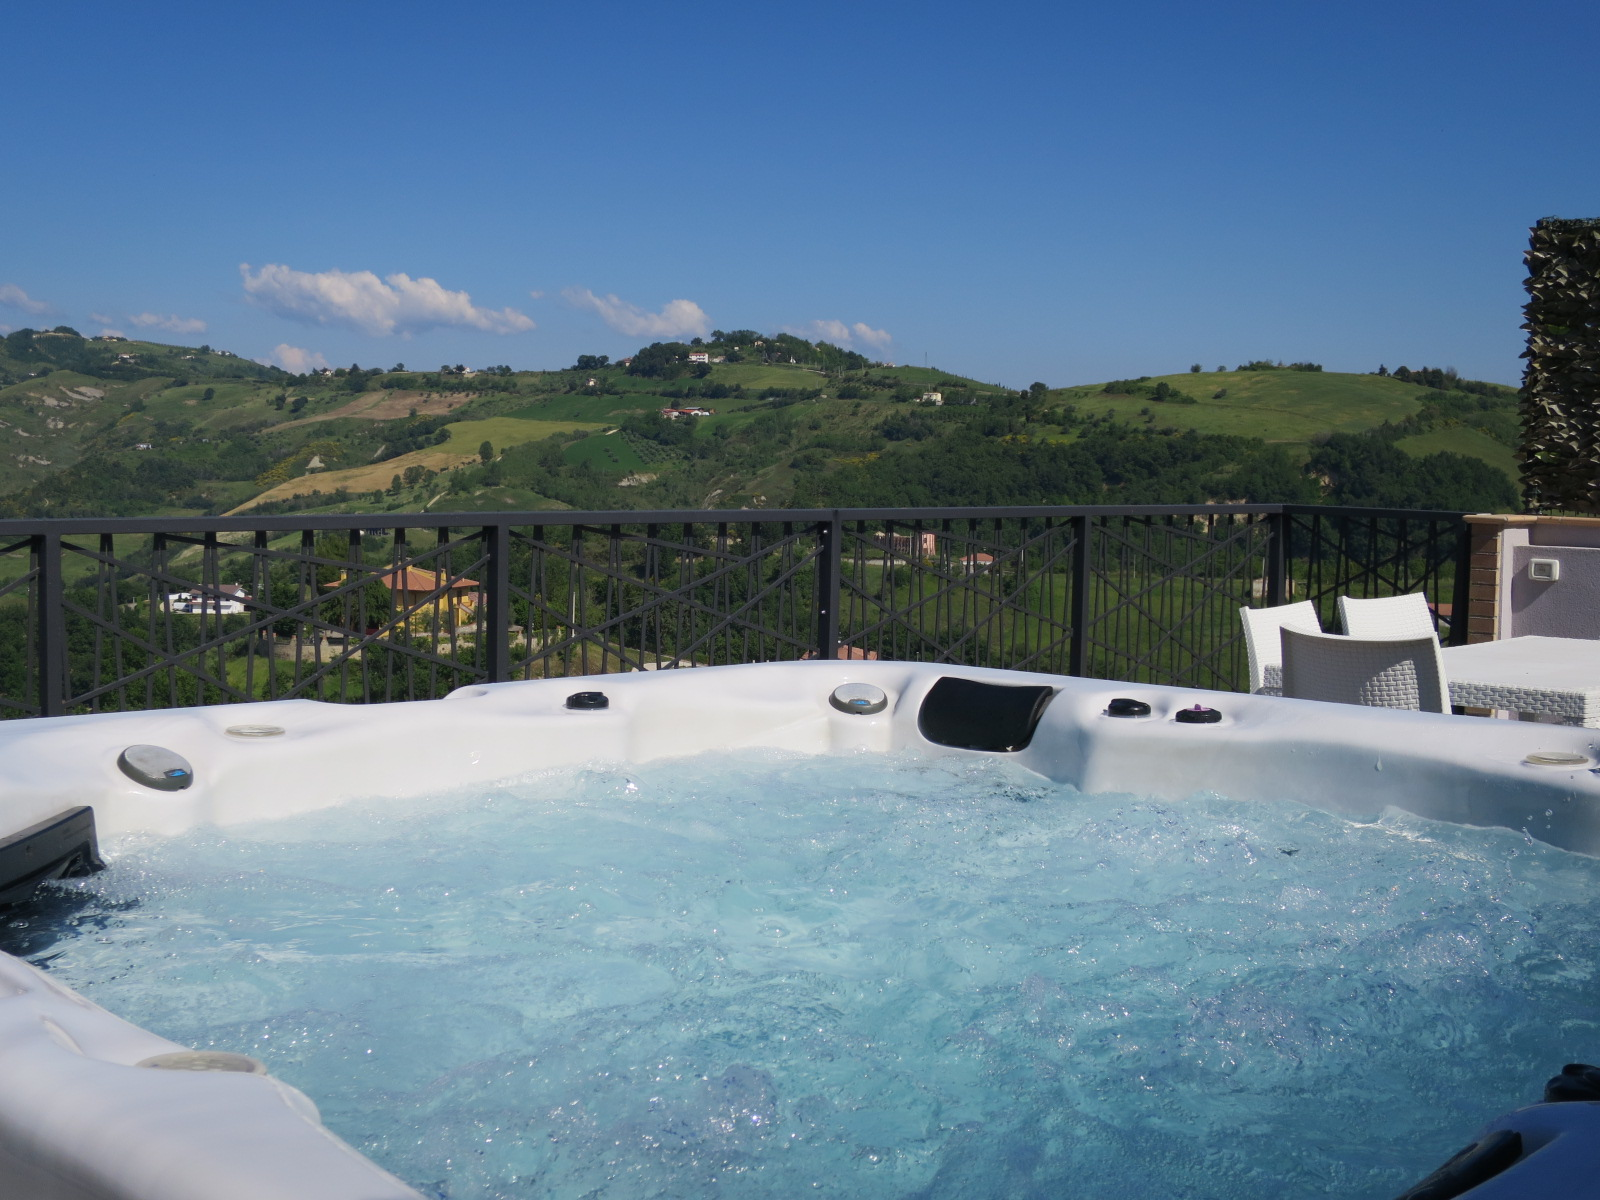 Townhouse Townhouse for sale Montefino (TE), Casa Montefiore - Montefino - EUR 315.457 350